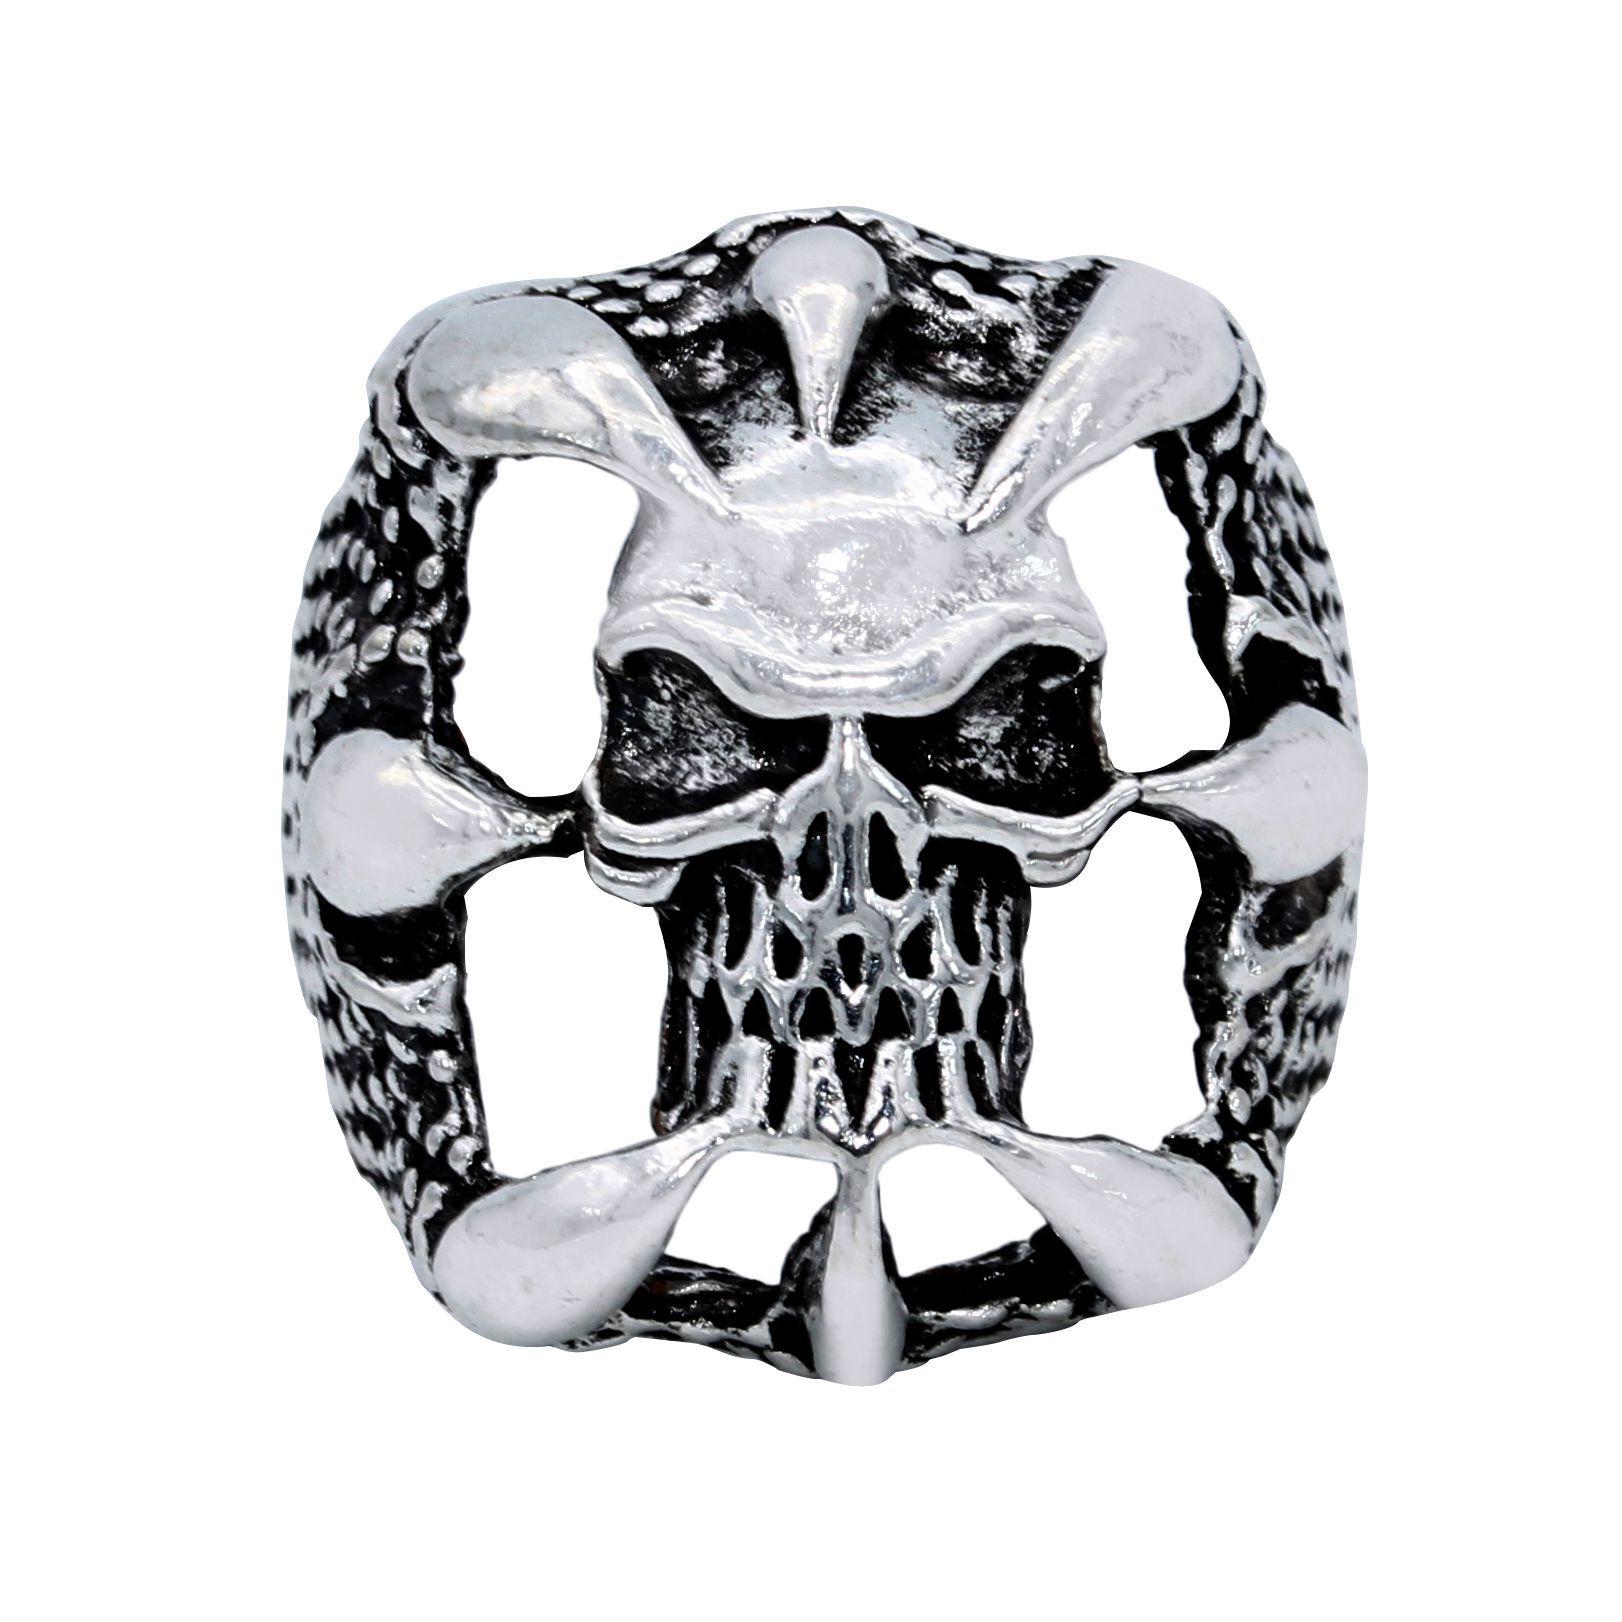 DzineTrendz Brass Silver plated, retro Antique finish, , Skeleton head skull on fire design stylish fashion finger ring Men Boys